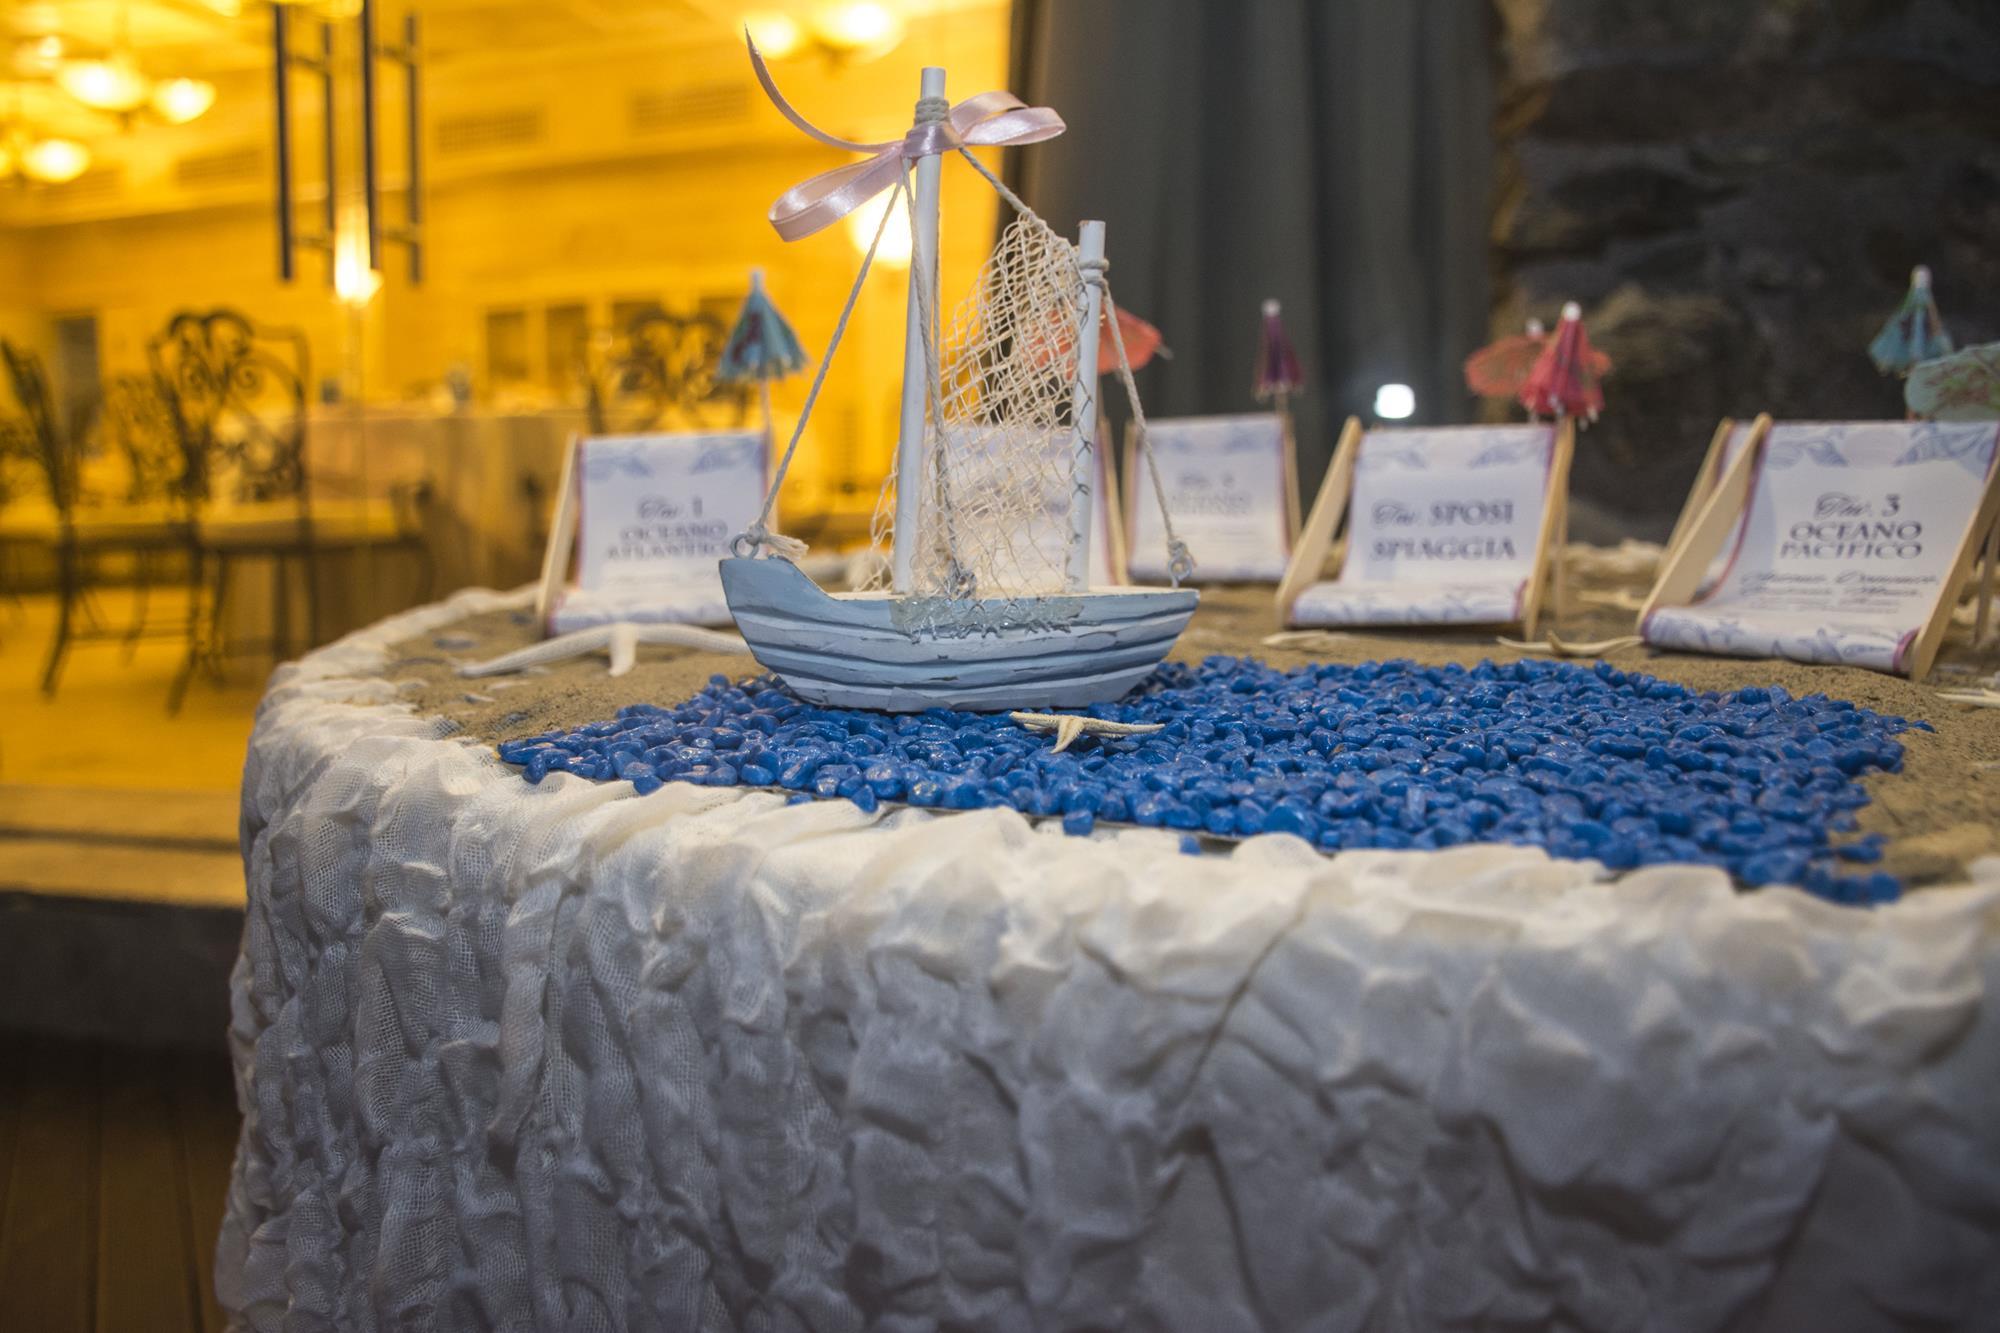 tableau-de-mariage-tema-mare-catania